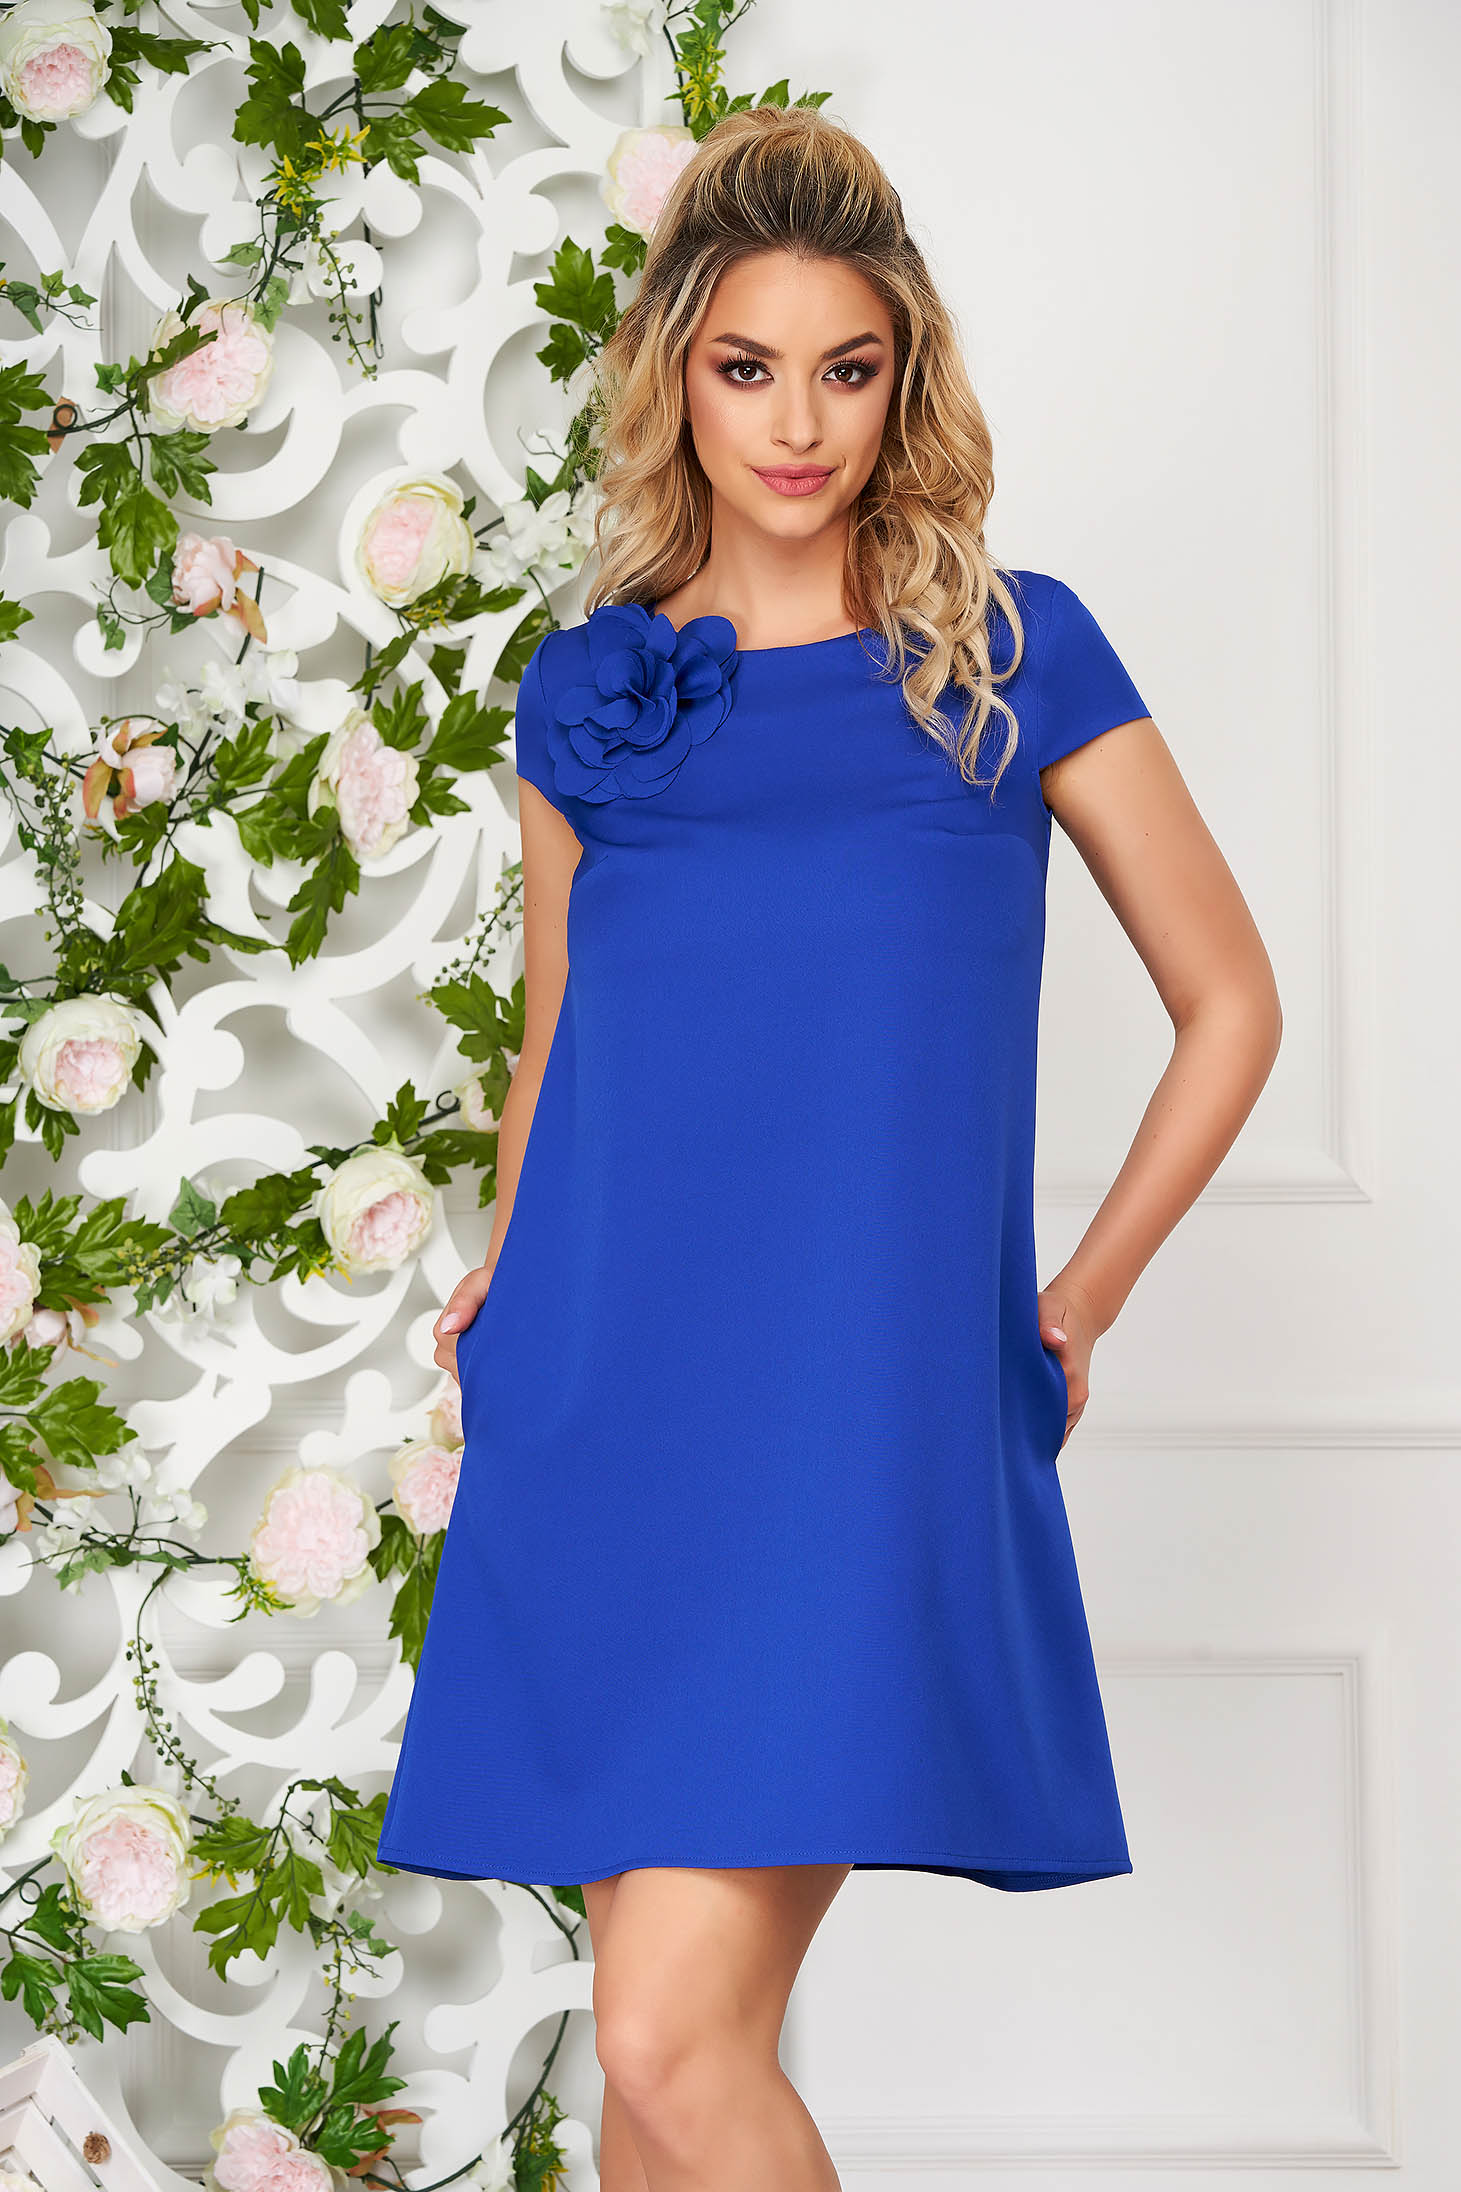 Rochie StarShinerS albastra scurta de zi cu croi larg din stofa elastica cu buzunare